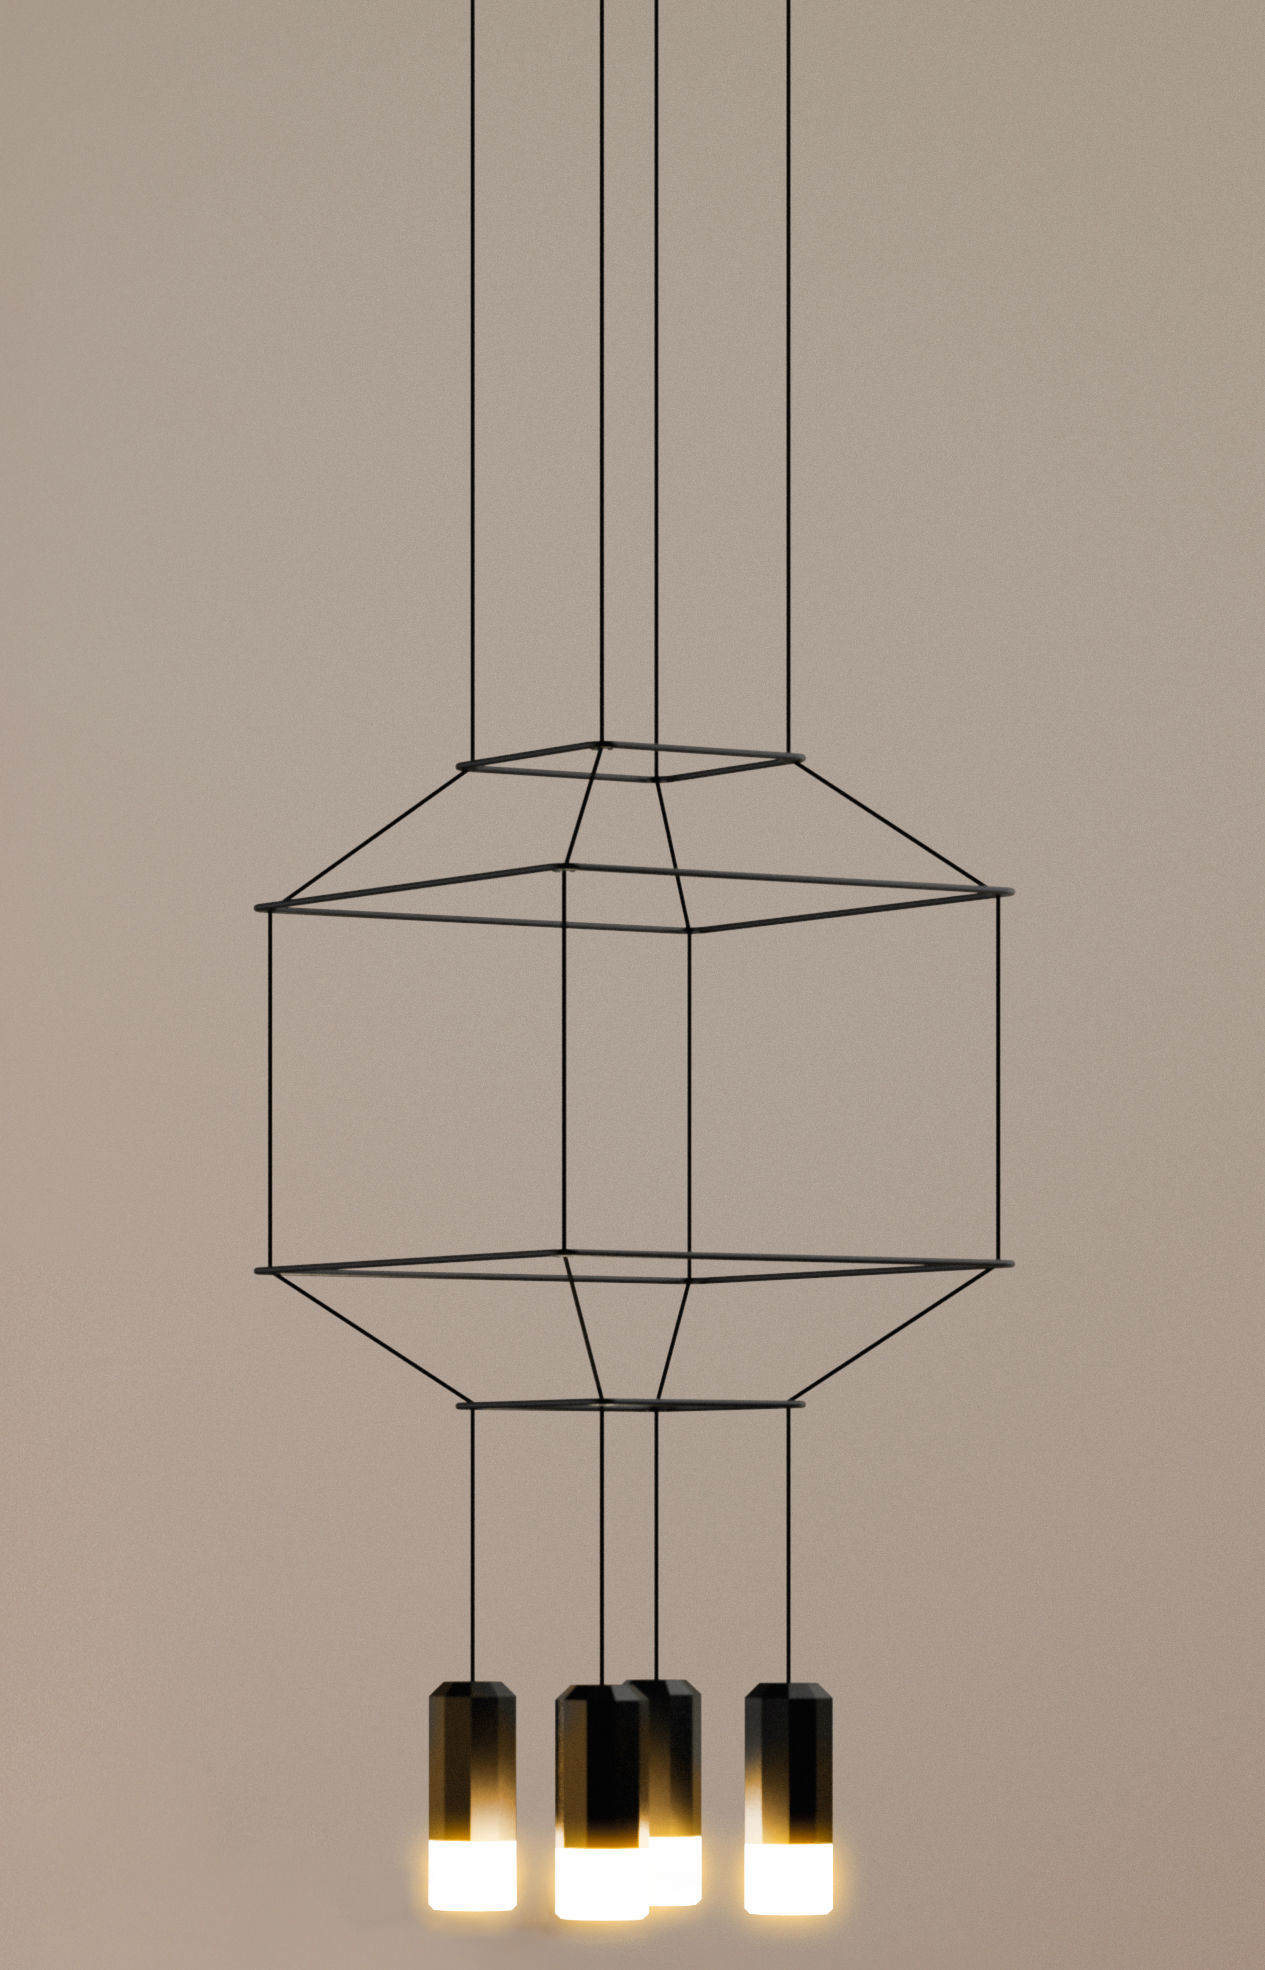 Leuchten - Pendelleuchten - Wireflow Pendelleuchte / 30 x 30 x H 32,5 cm - Vibia - Schwarz - Gewebe, Glas, lackiertes Metall, Teflon